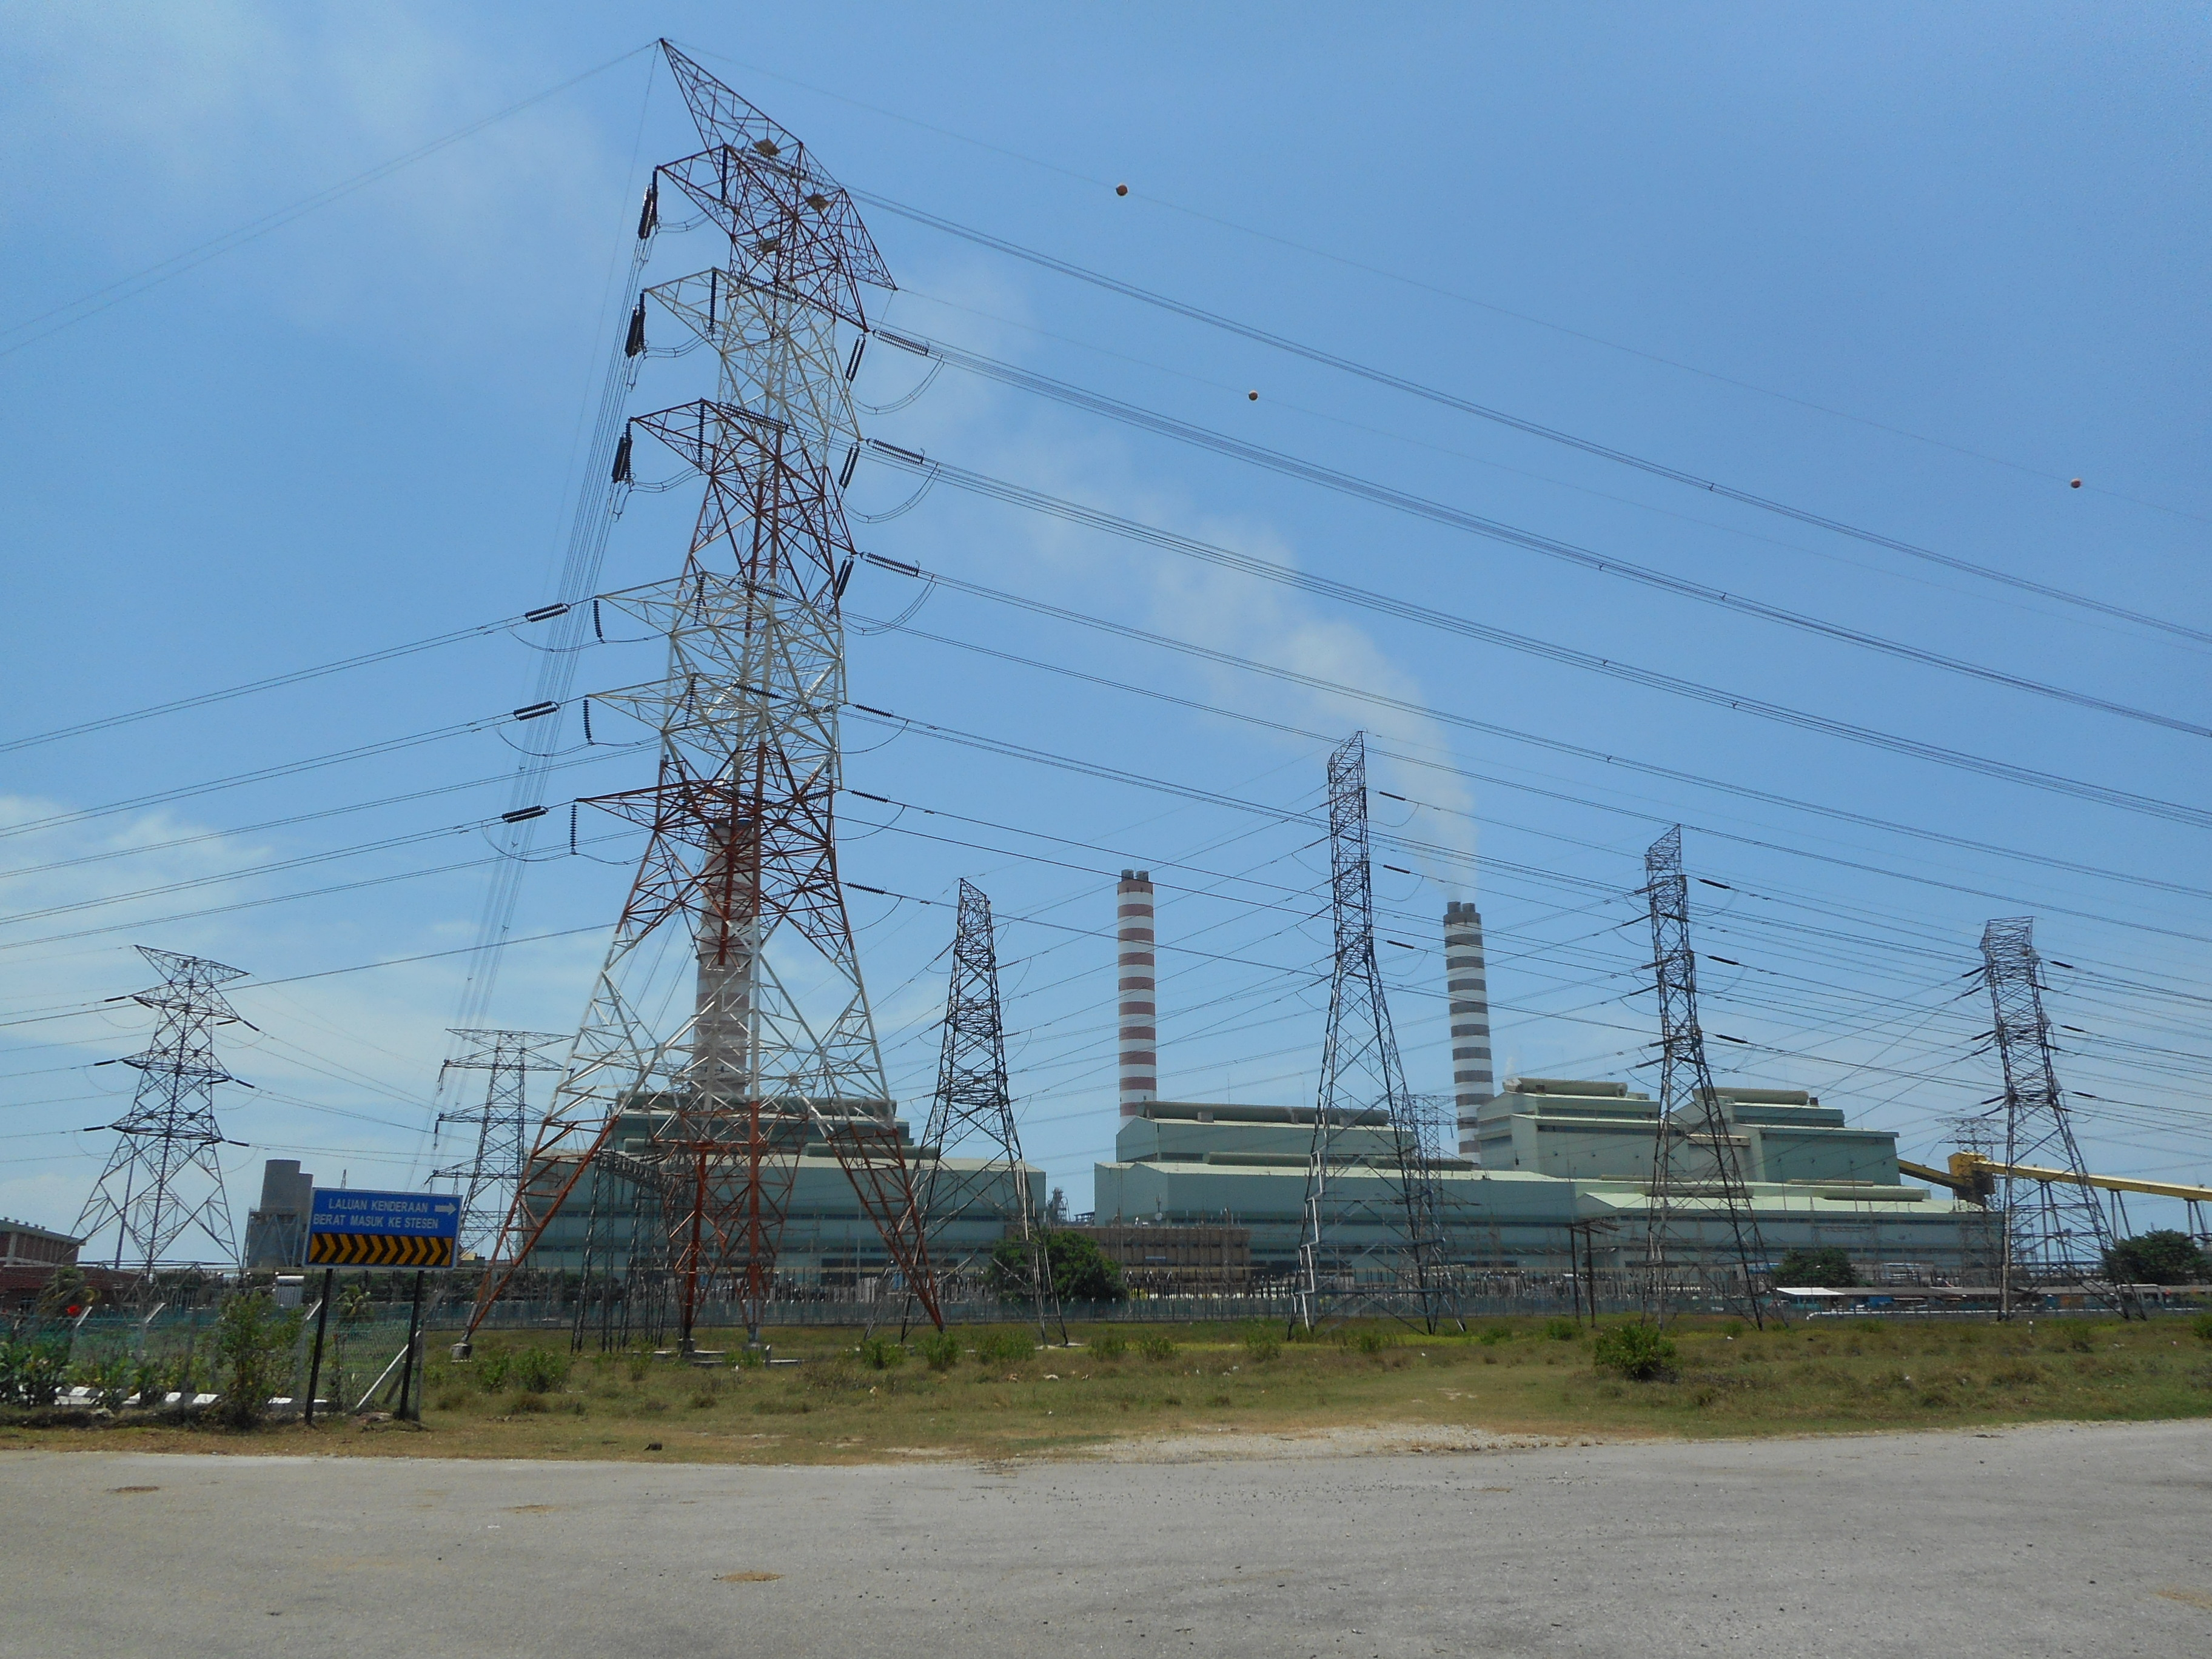 Sultan Salahuddin Abdul Aziz Power Station